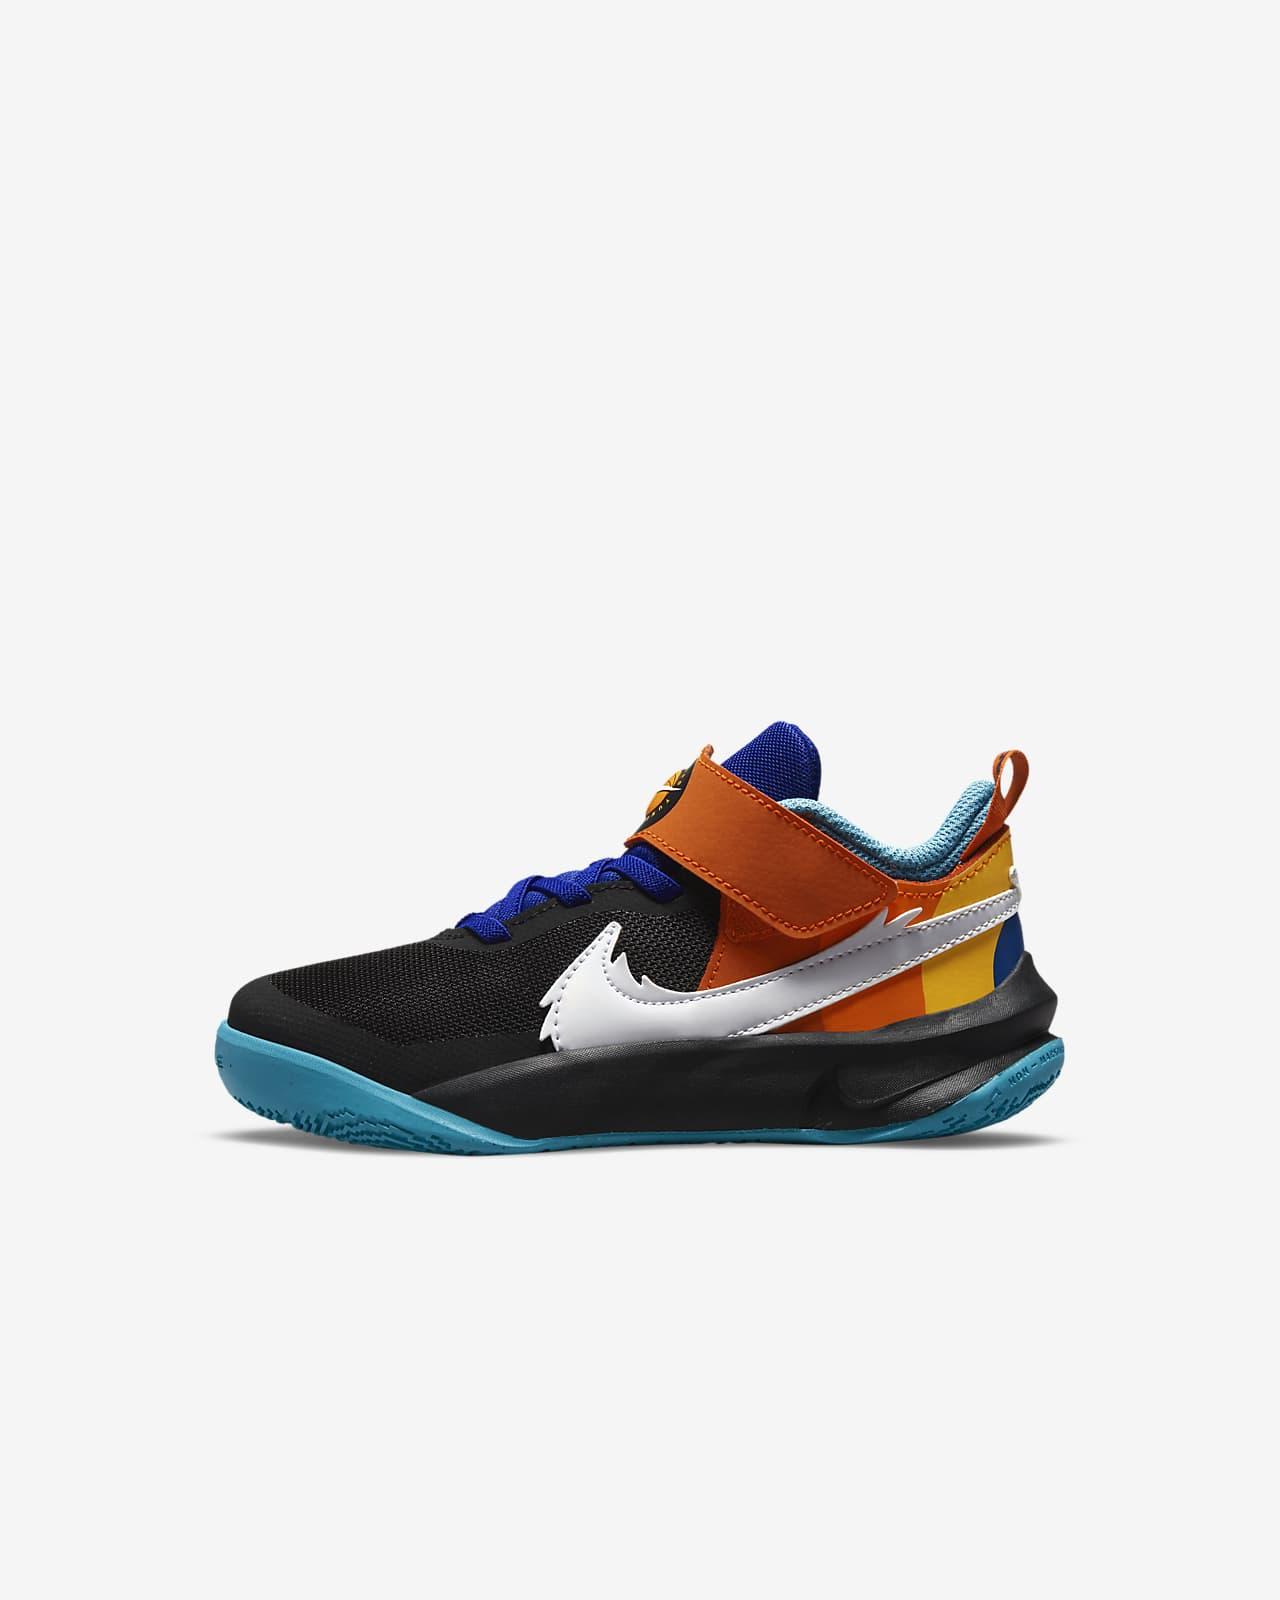 Scarpa Nike Team Hustle D 10 SE x Space Jam: A New Legacy - Bambini